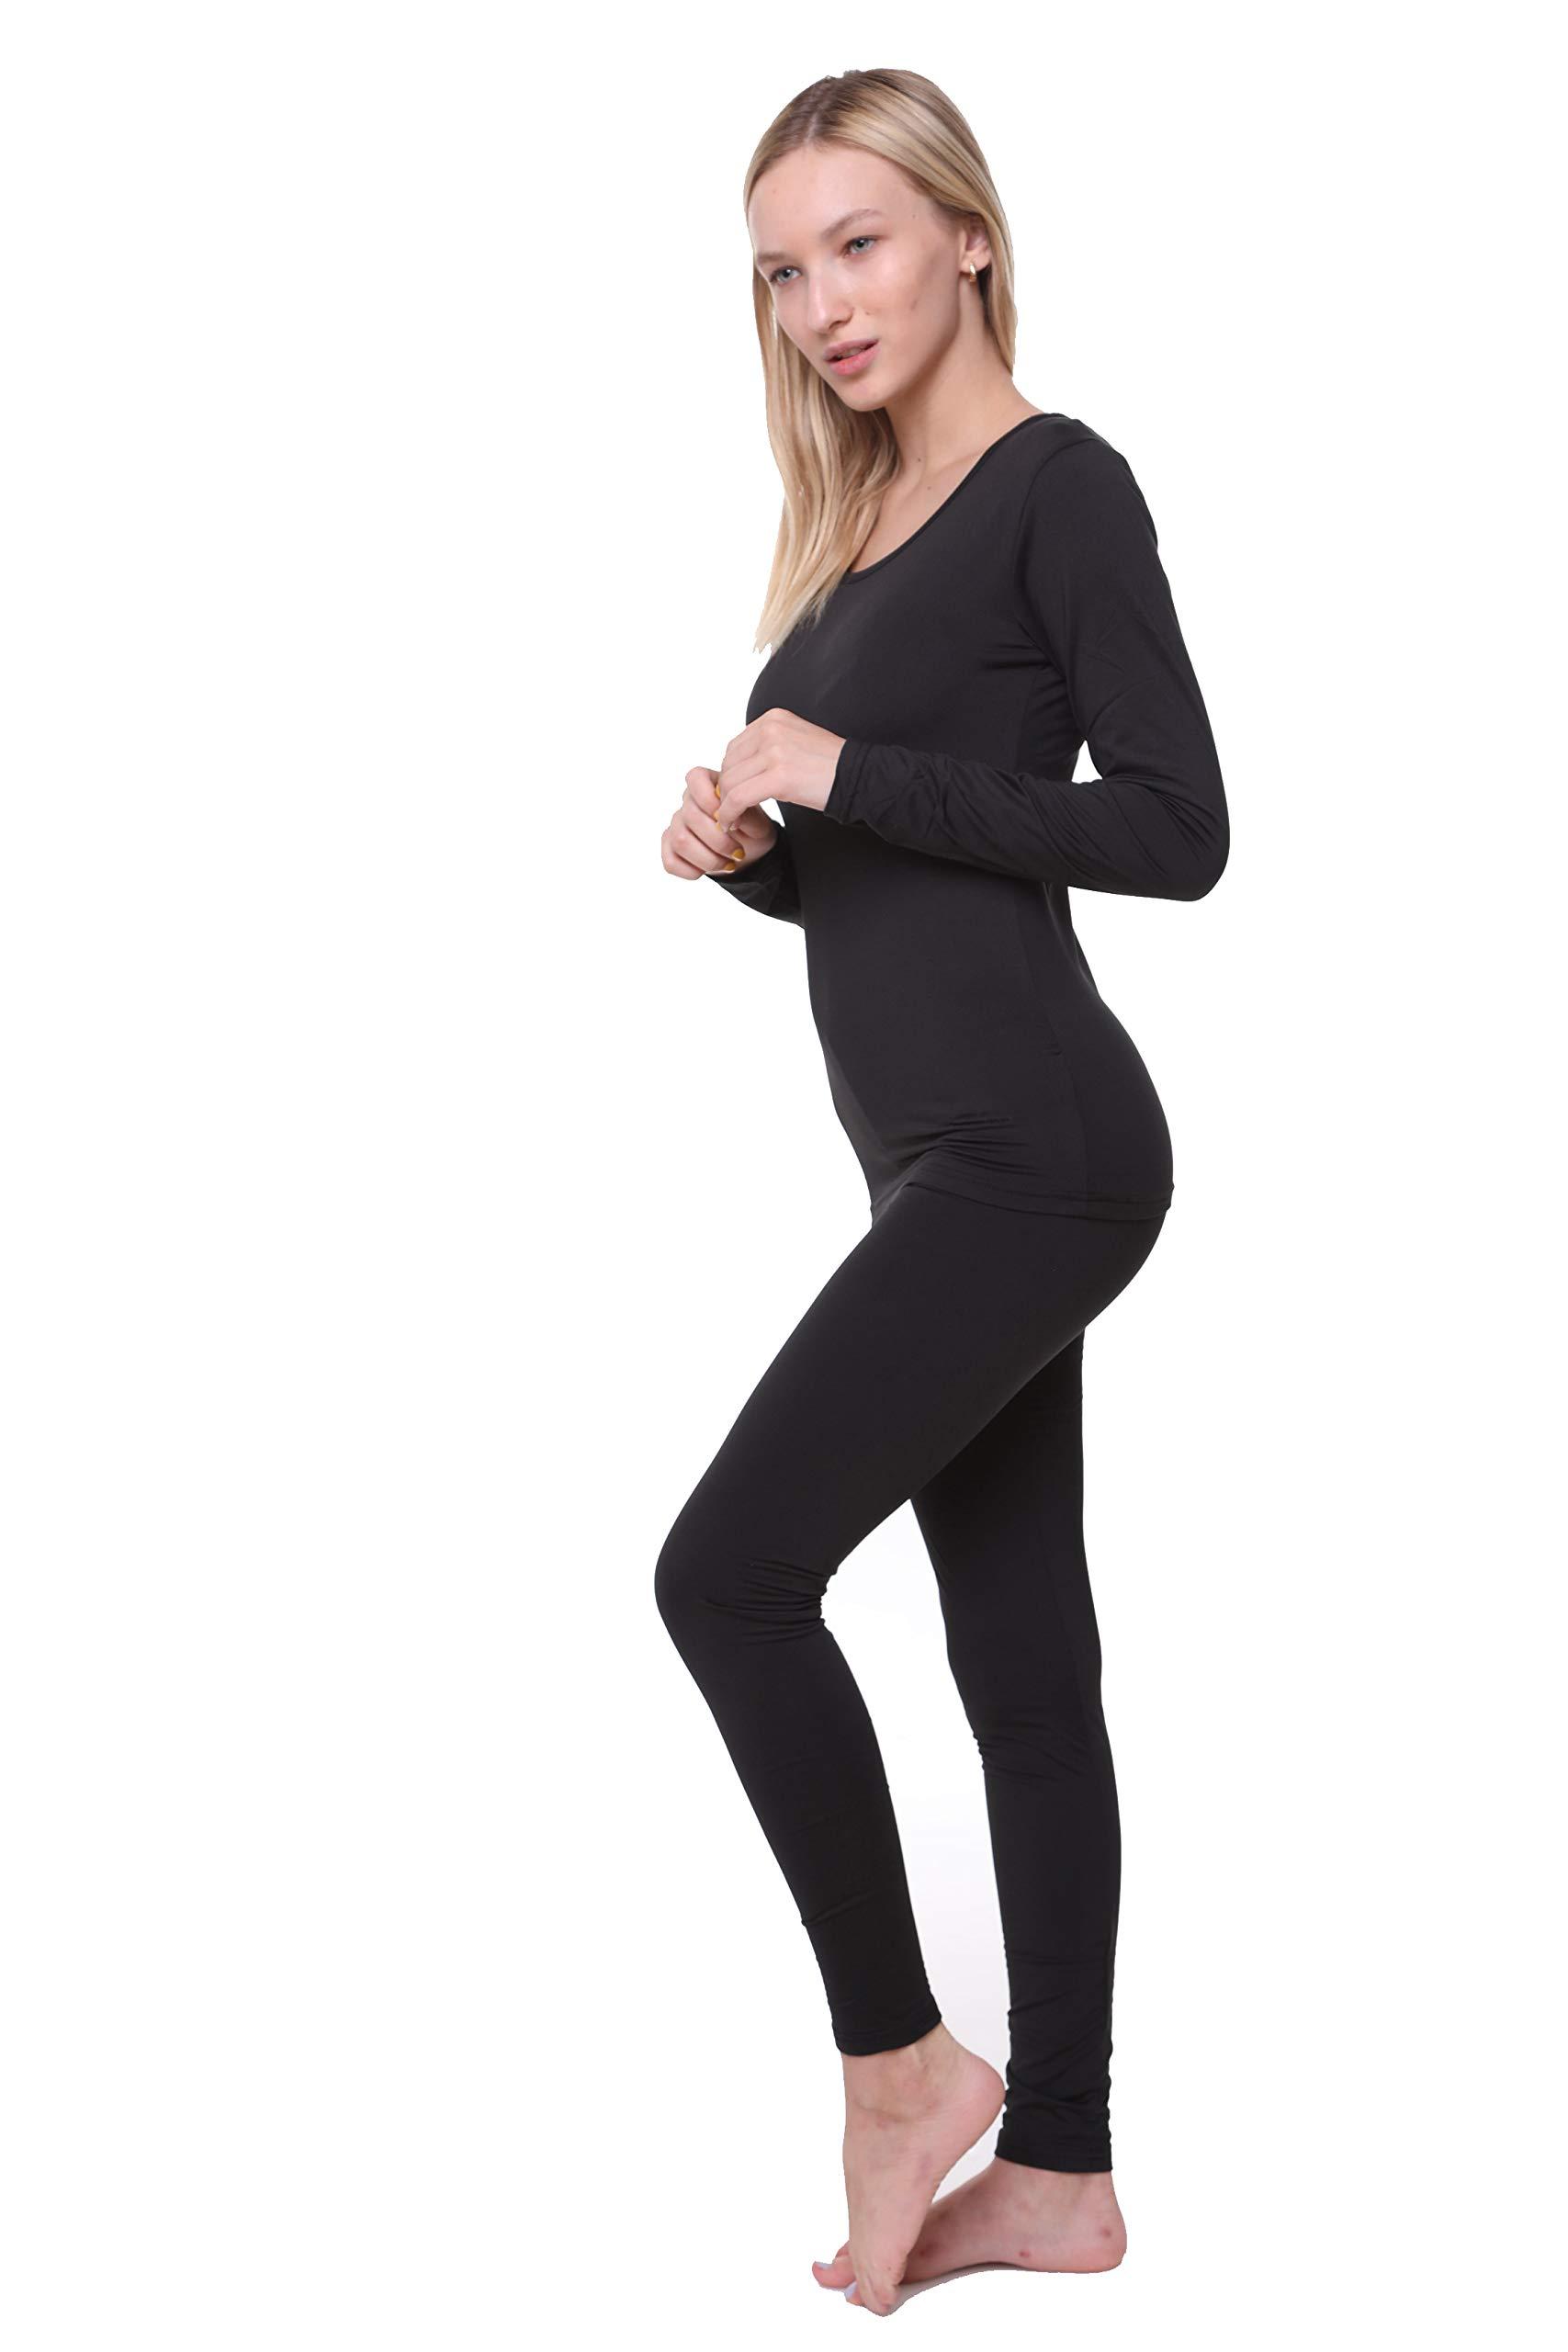 cb9b586184e652 Women Thermal Underwear Set Outland; Base Layer; Soft Fleece; Top &  Leggings product